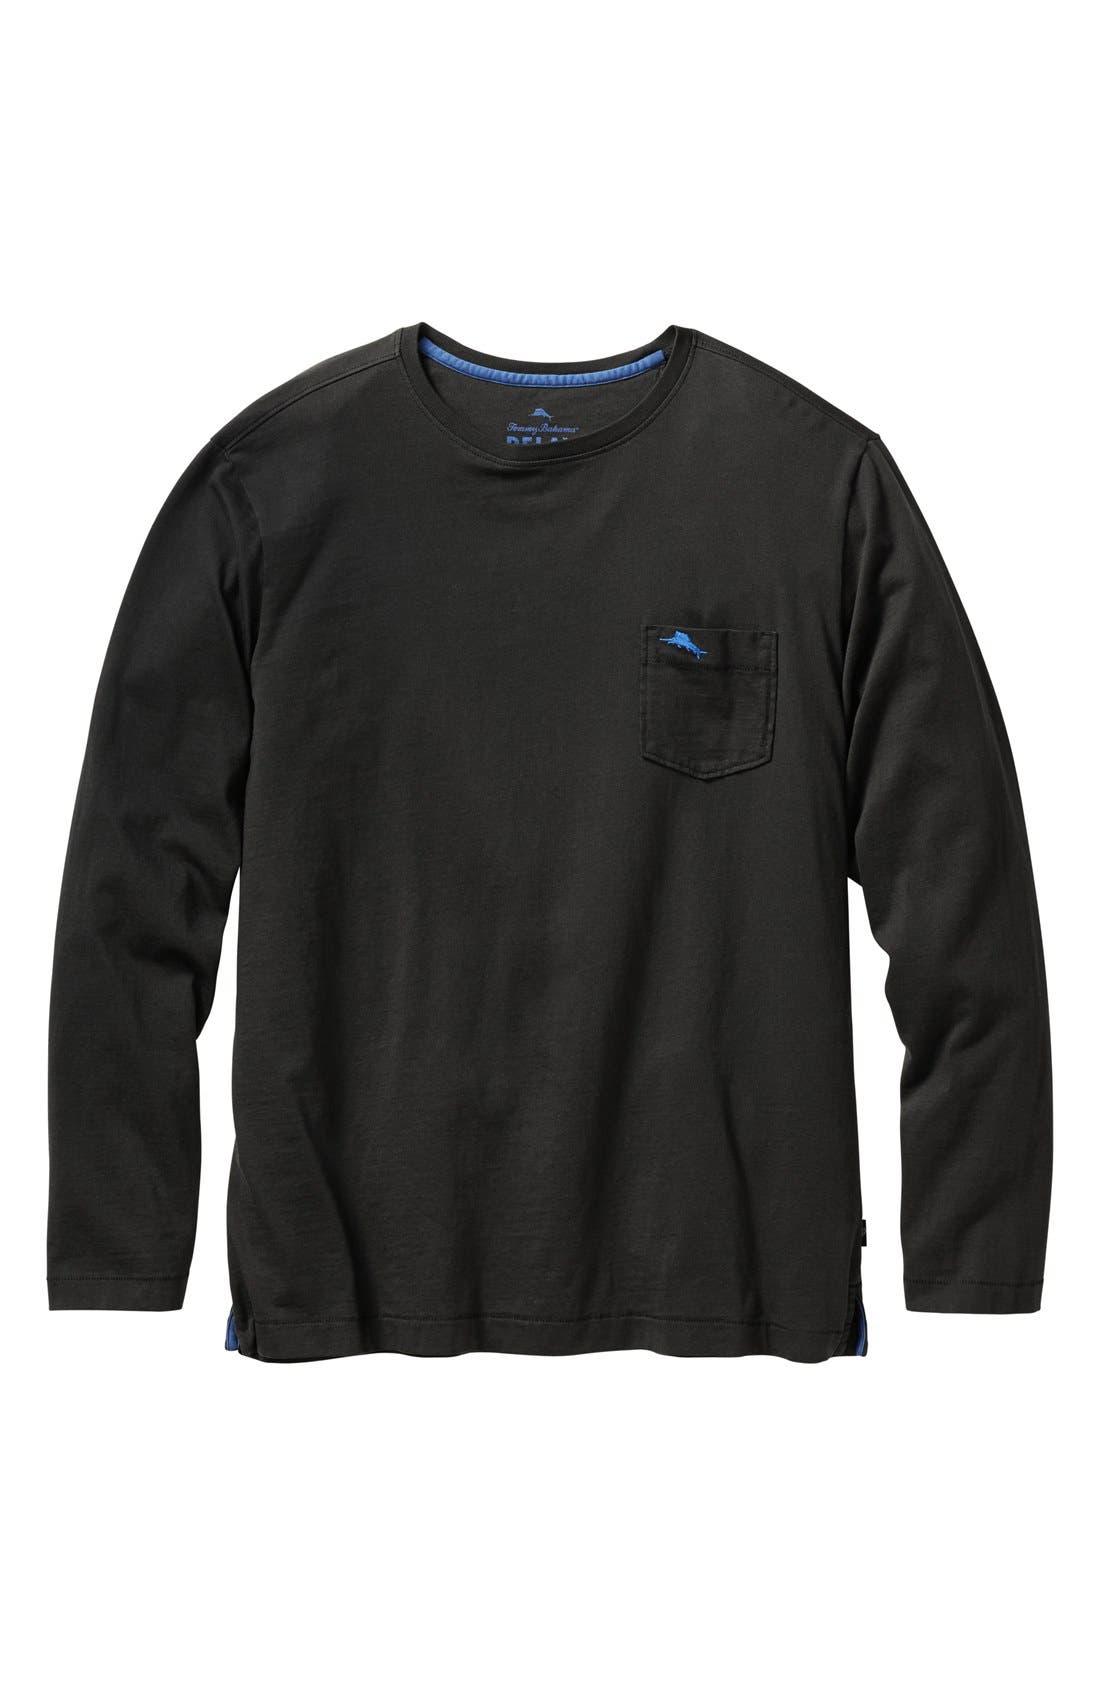 Tommy Bahama 'Bali Skyline' Long Sleeve Pima Cotton T-Shirt (Big & Tall)